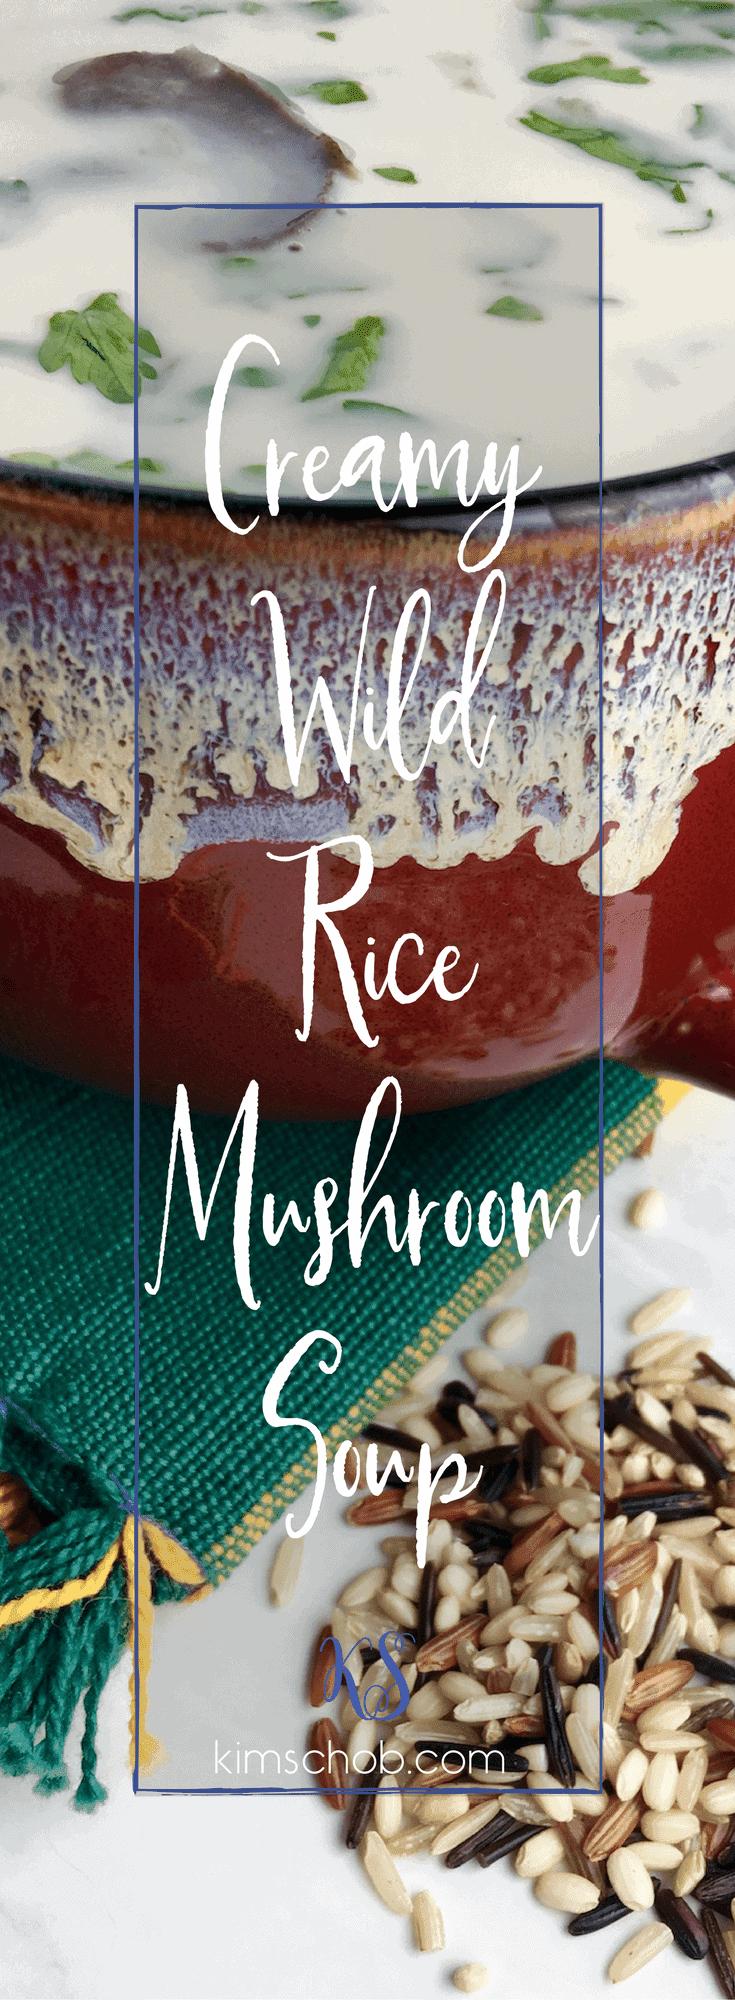 Creamy Wild Rice Mushroom Soup | kimschob.com #wildricemushroomsoup #kimschob